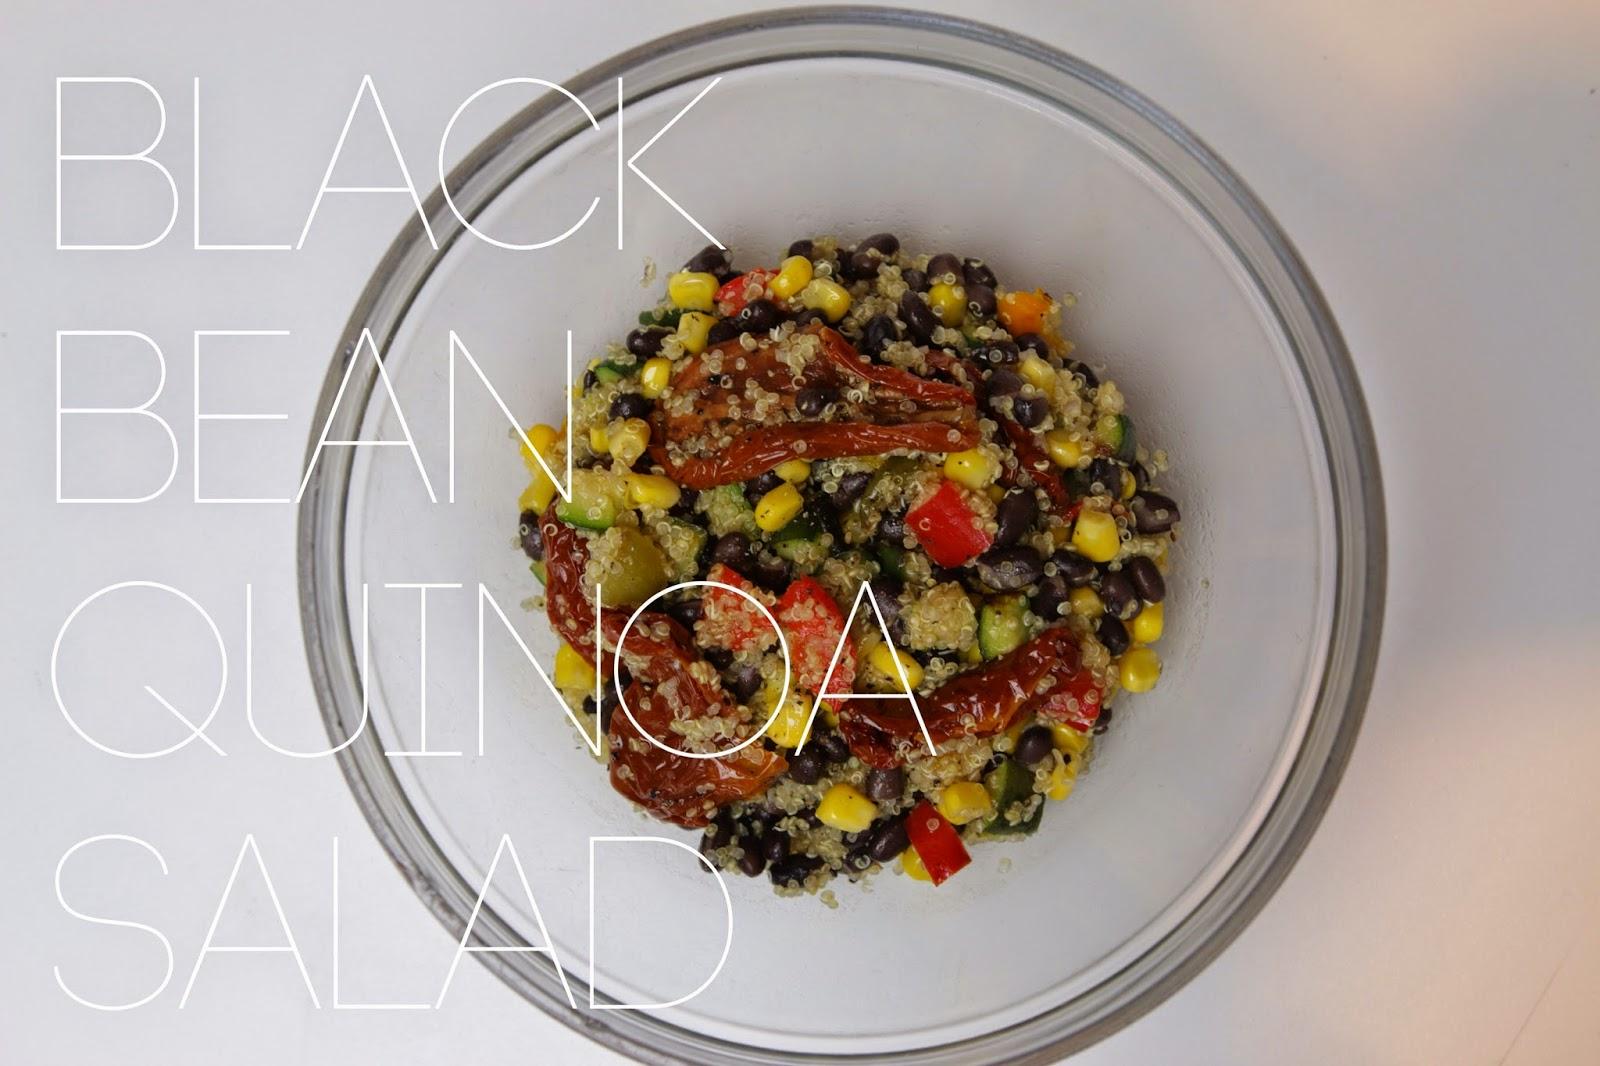 Gluten-free-black-bean-quinoa-salad